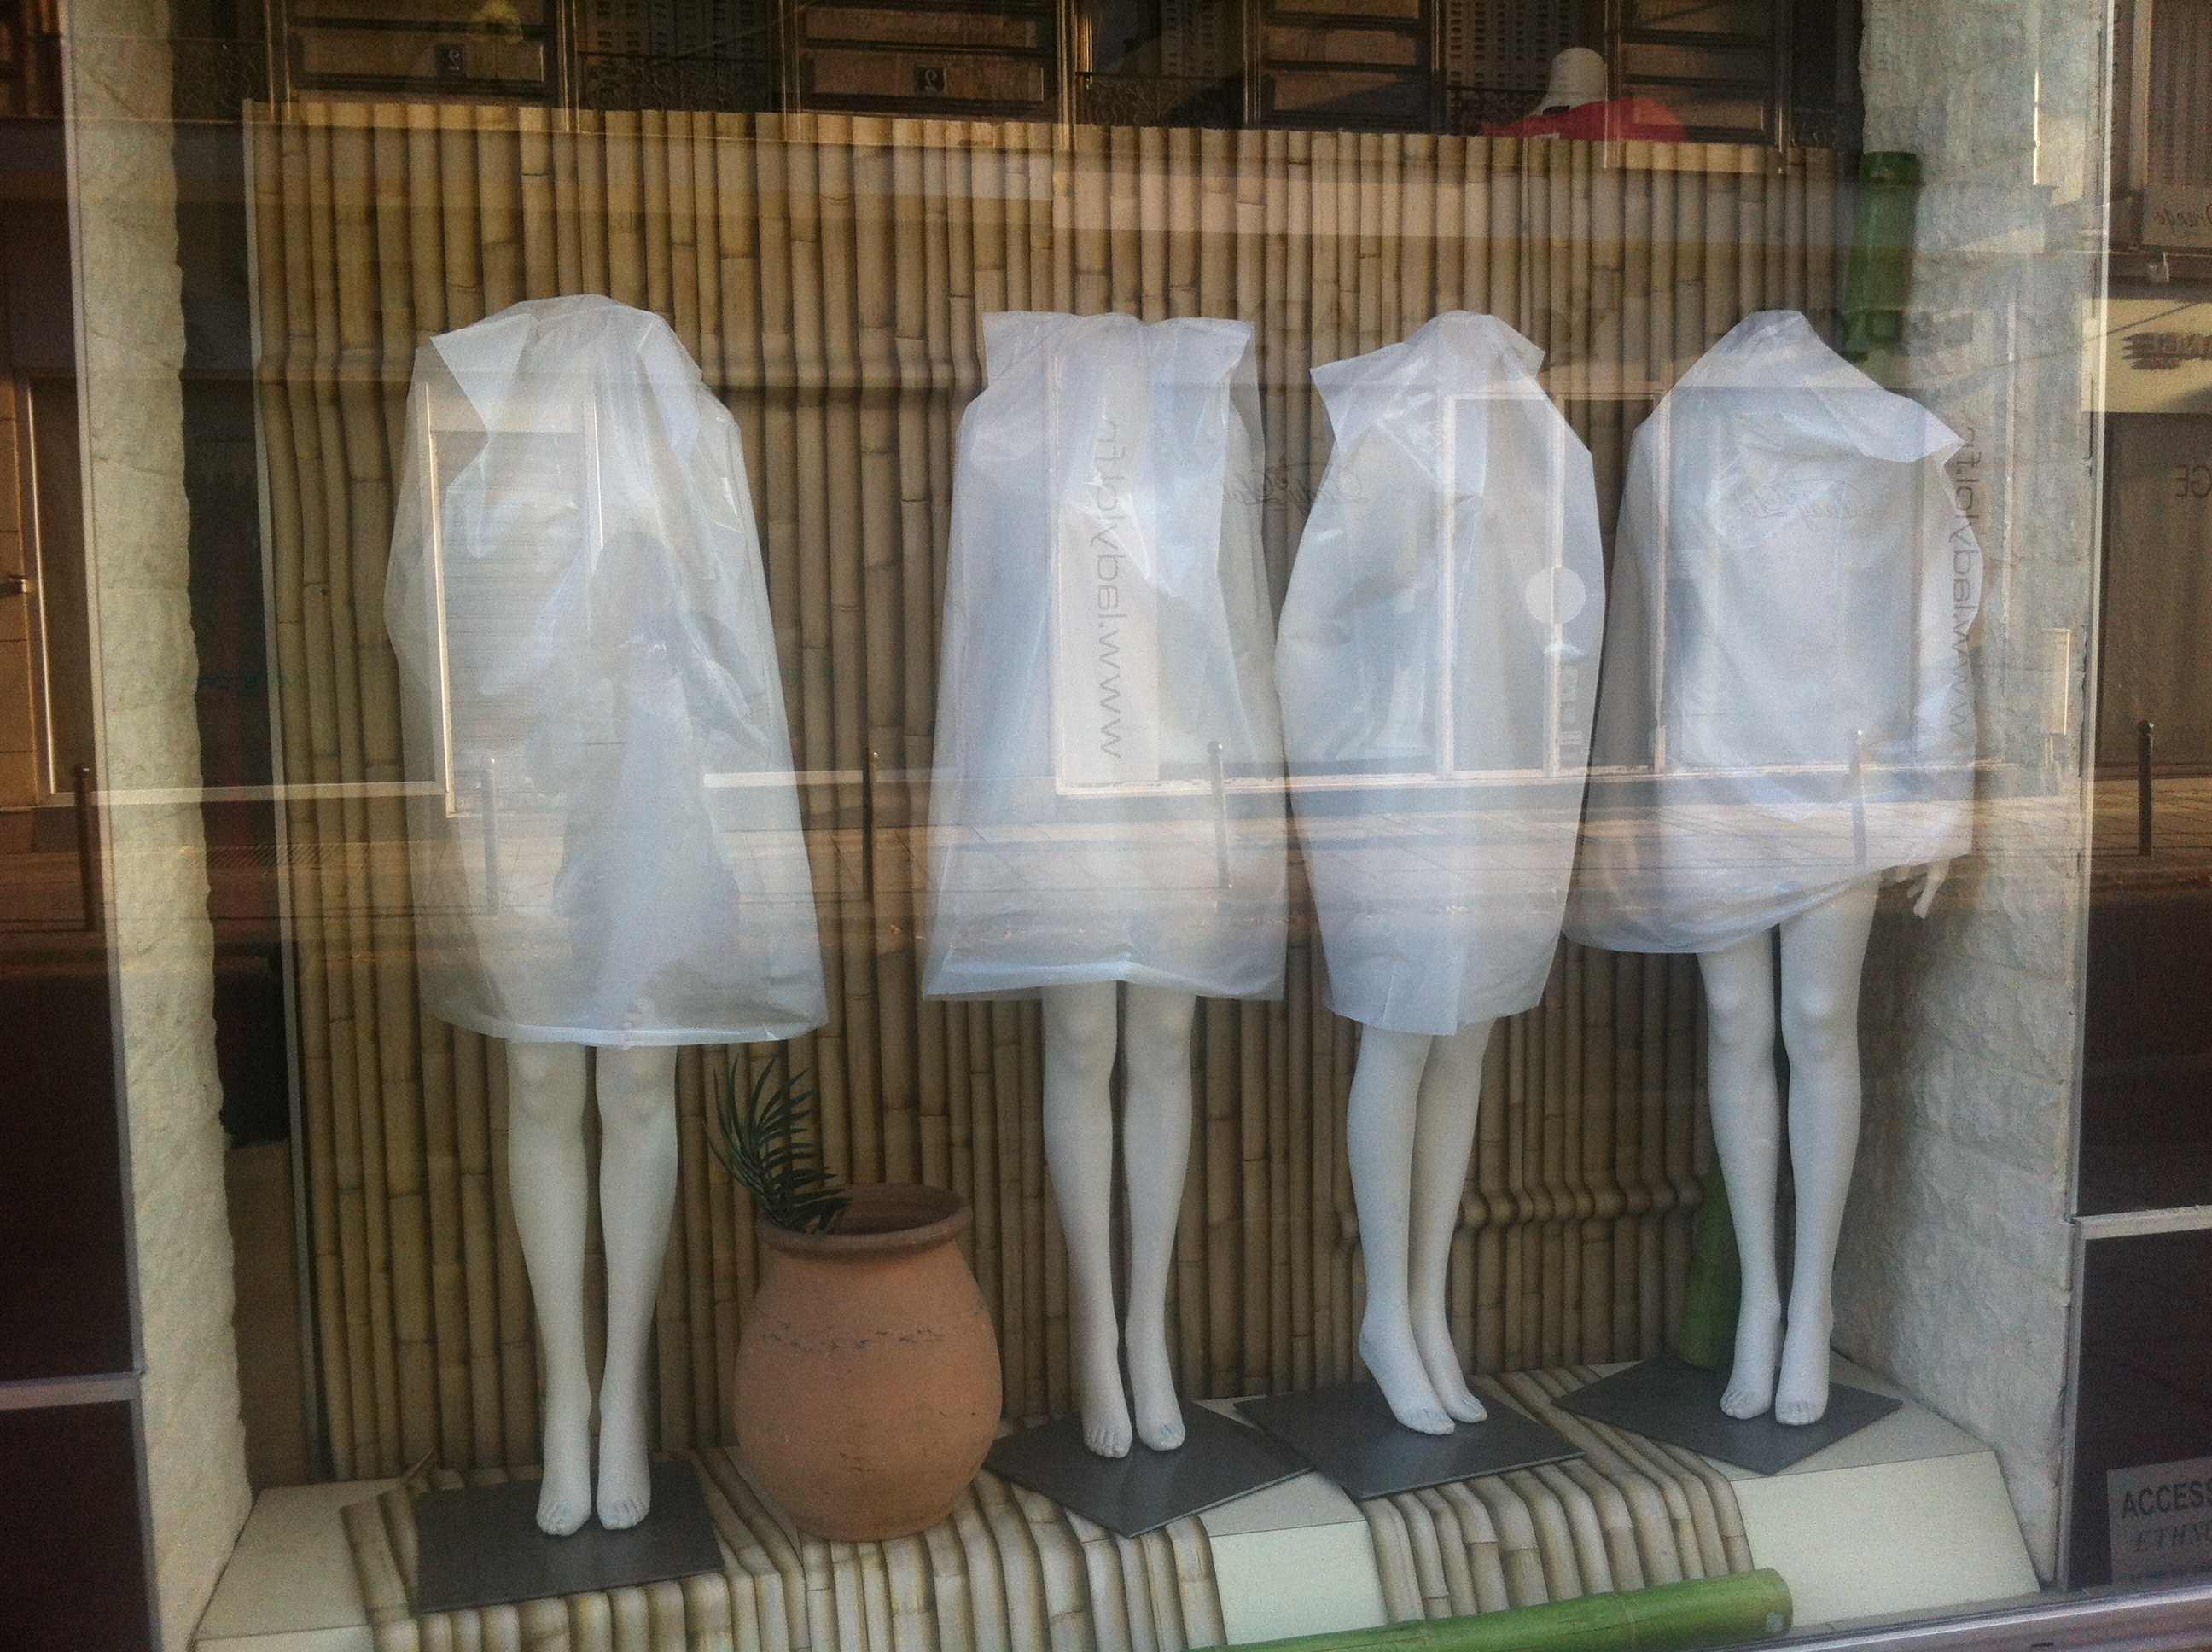 2012-08-25-Mannequins.jpg